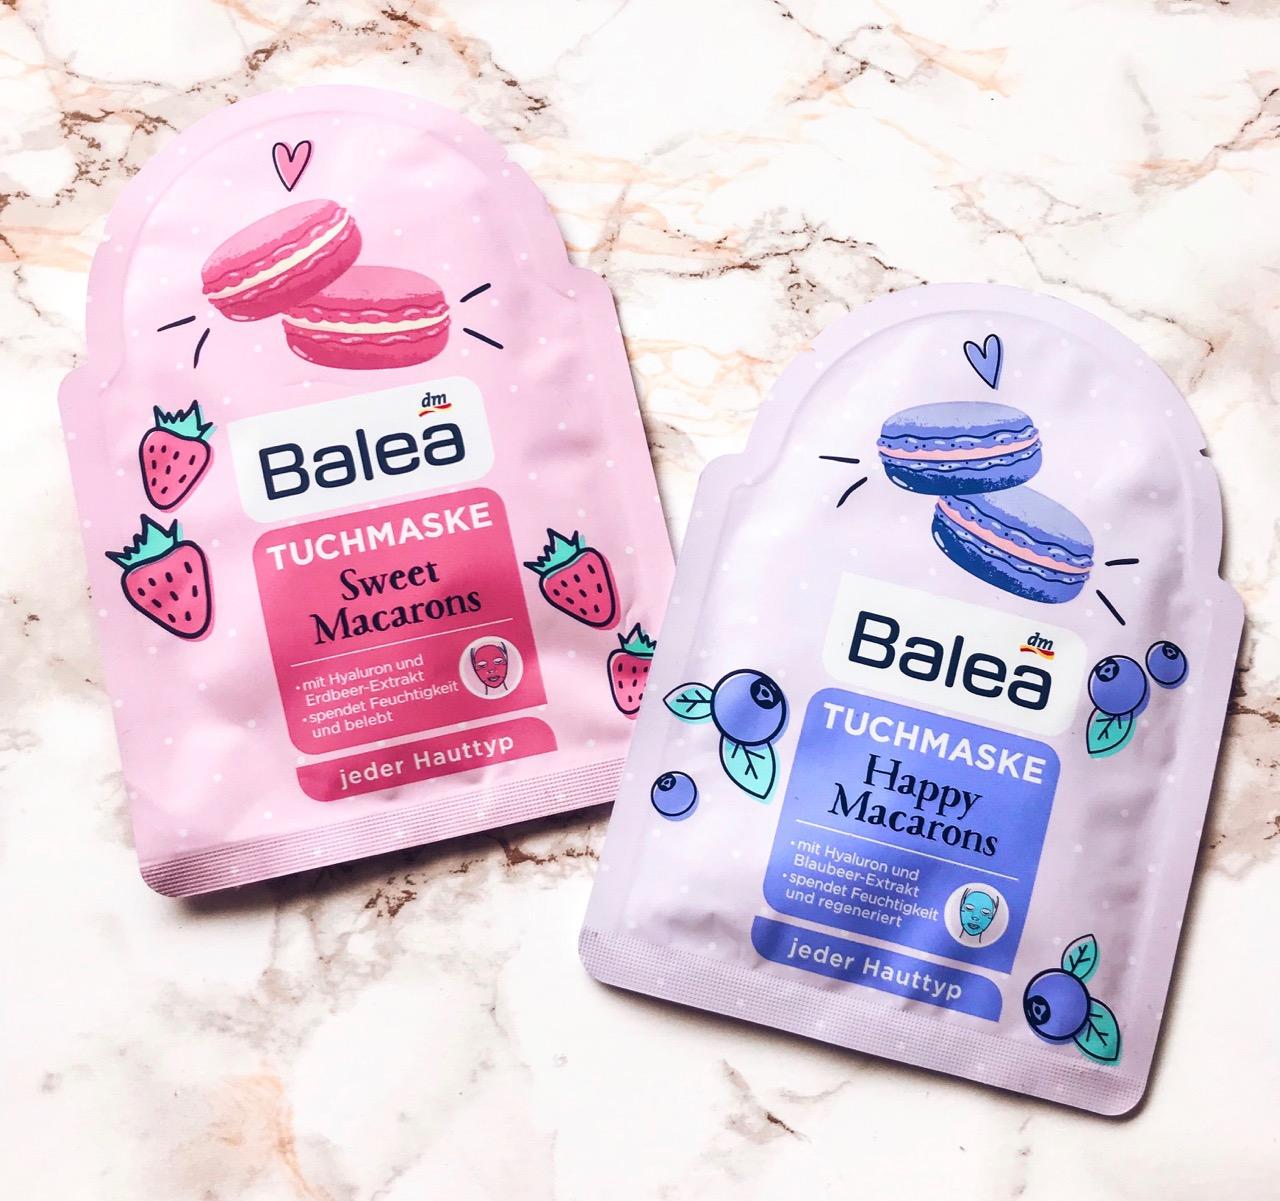 Balea Tuchmasken Sweet Macarons Test